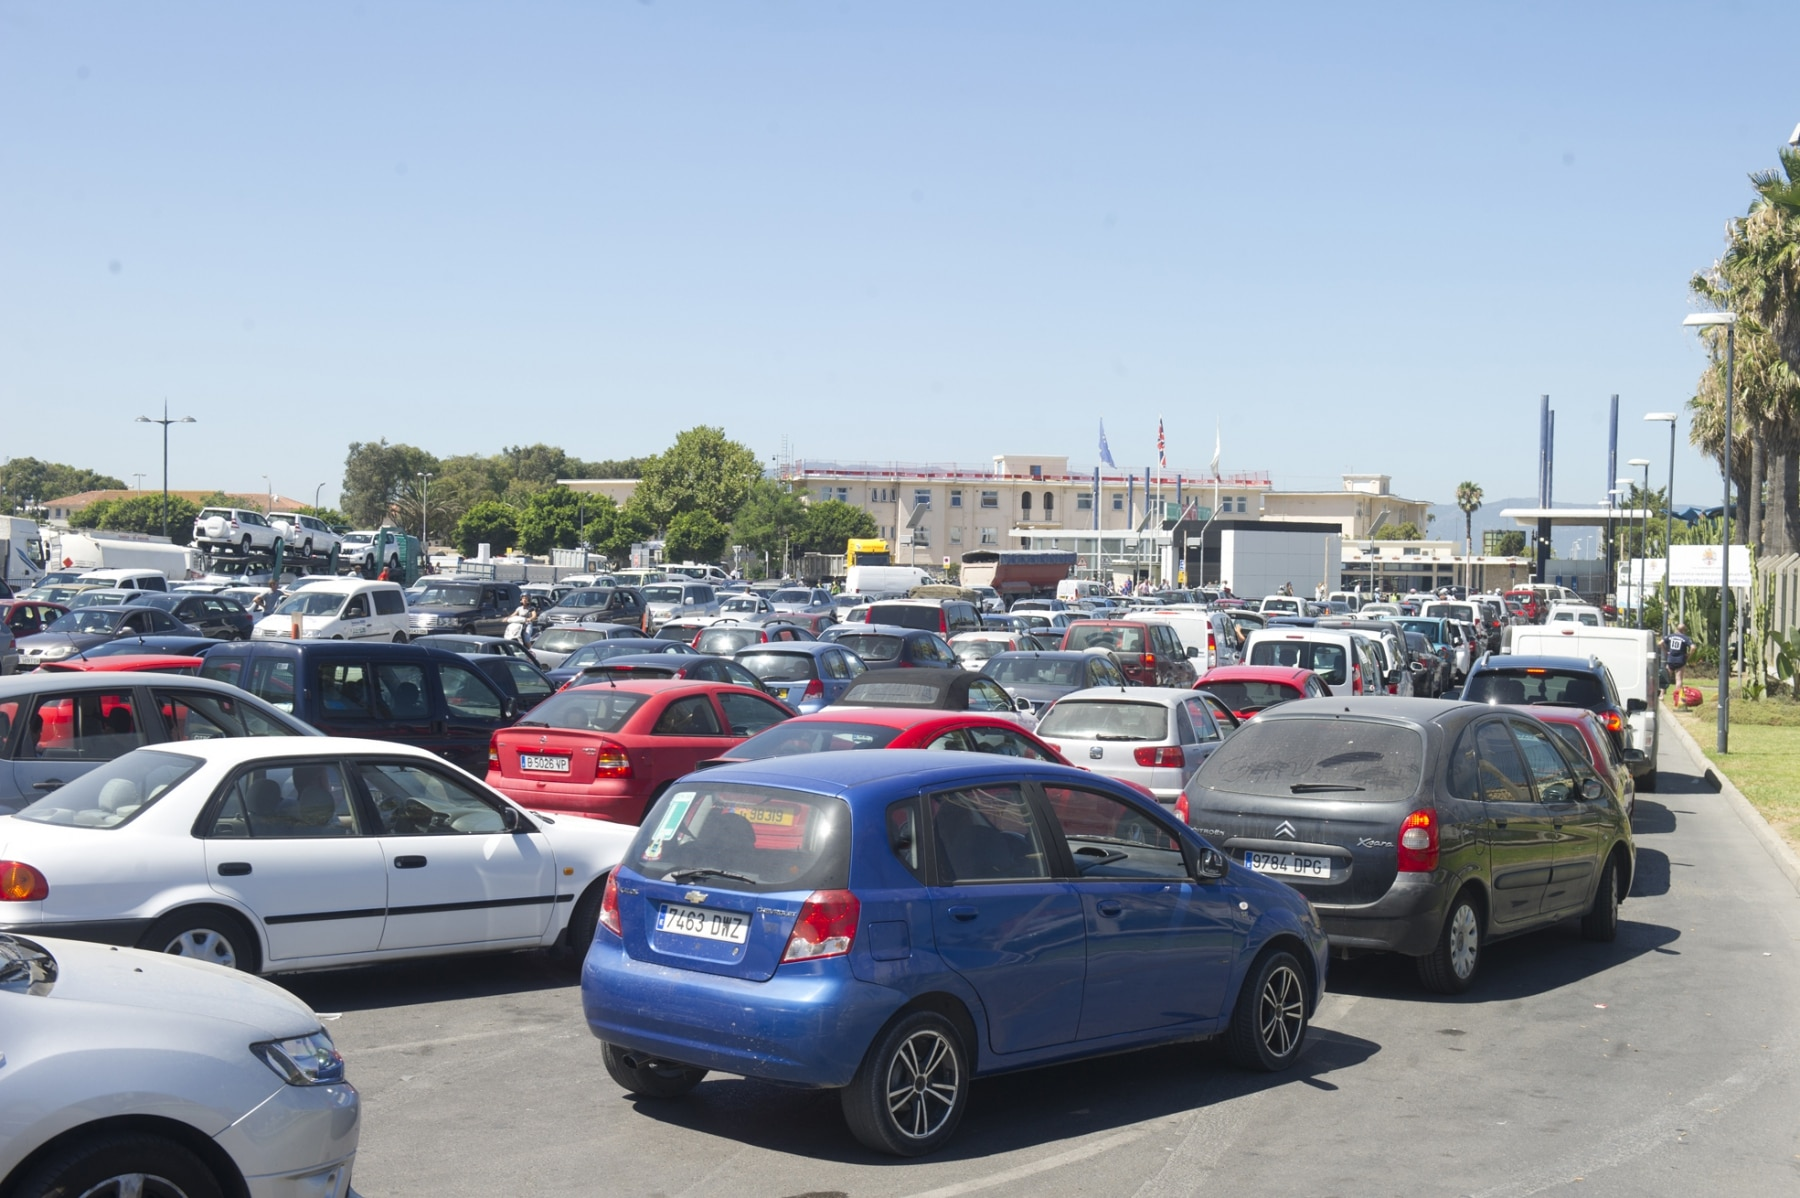 21-agosto-2014-colas-de-entrada-y-salida-de-gibraltar26_14803026949_o